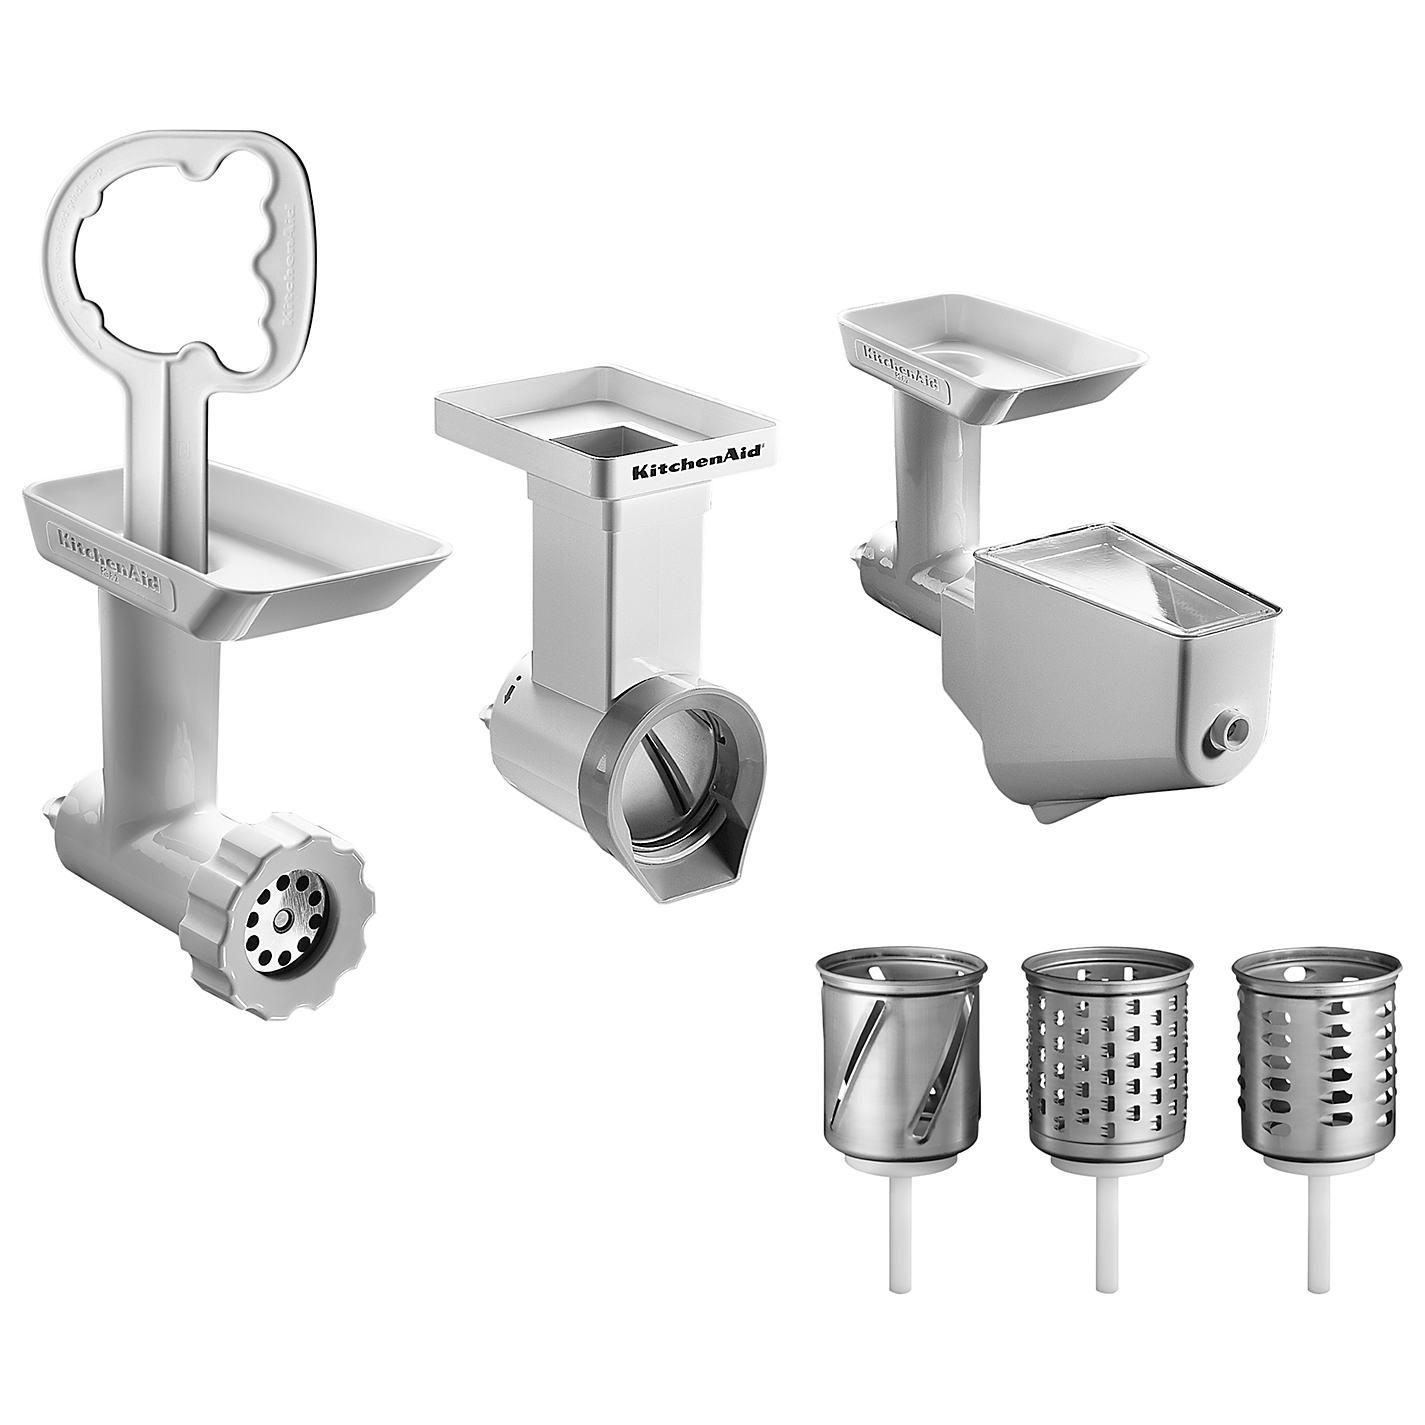 Kitchenaid Fppa Mixer Attachment Pack For Stand Mixers #22: Kitchenaid Fppc Stand Food Mixer Attachment Pack White Ebay